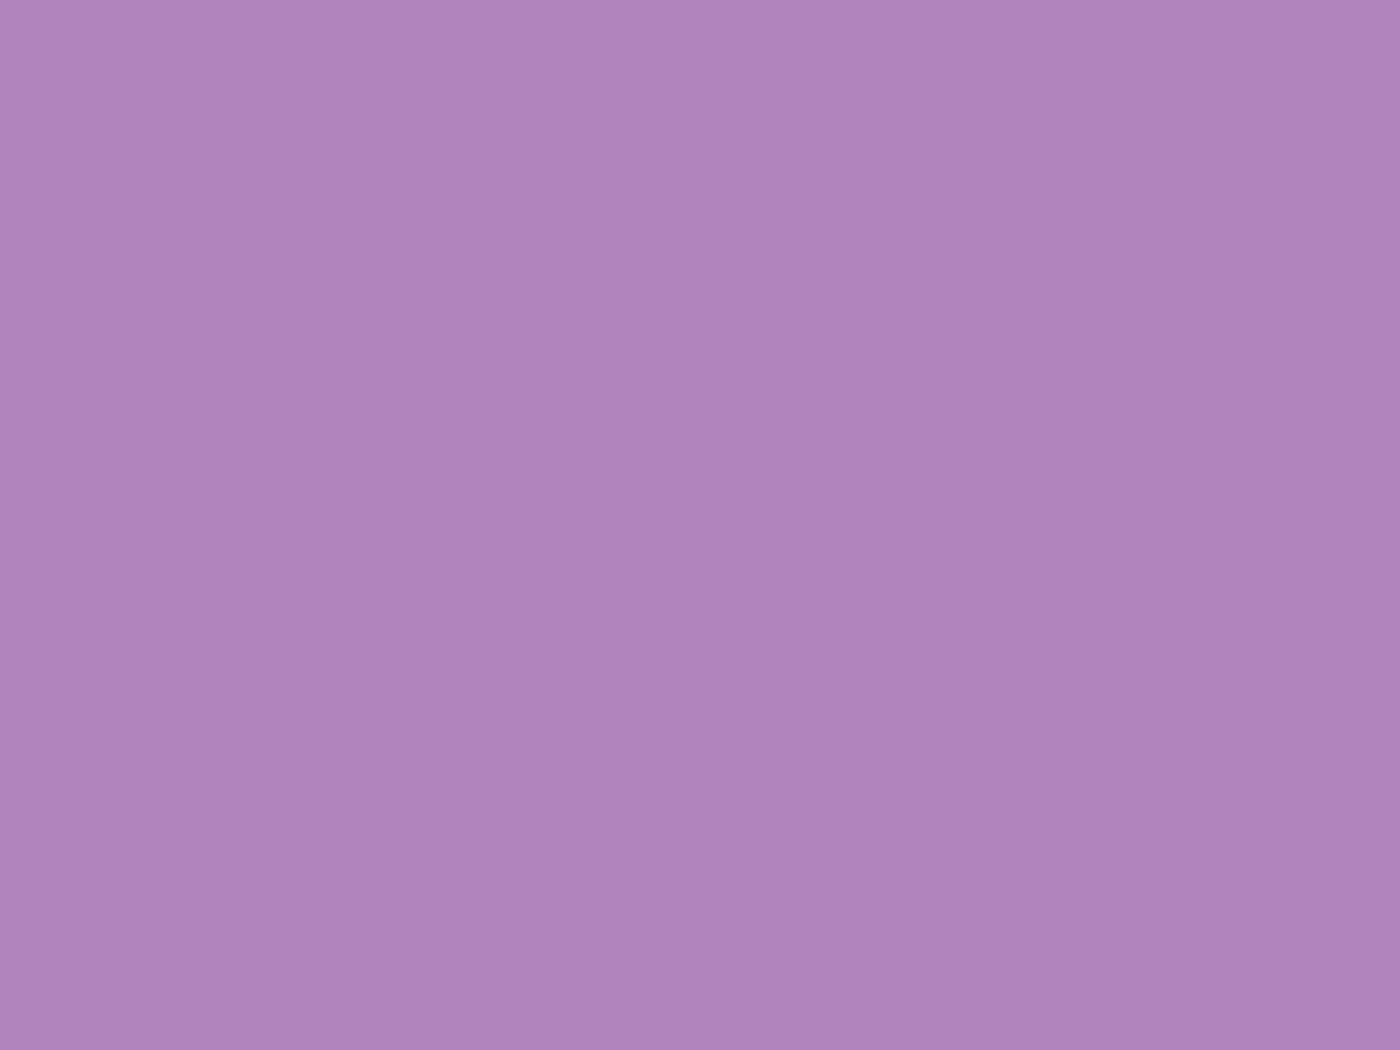 1400x1050 African Violet Solid Color Background